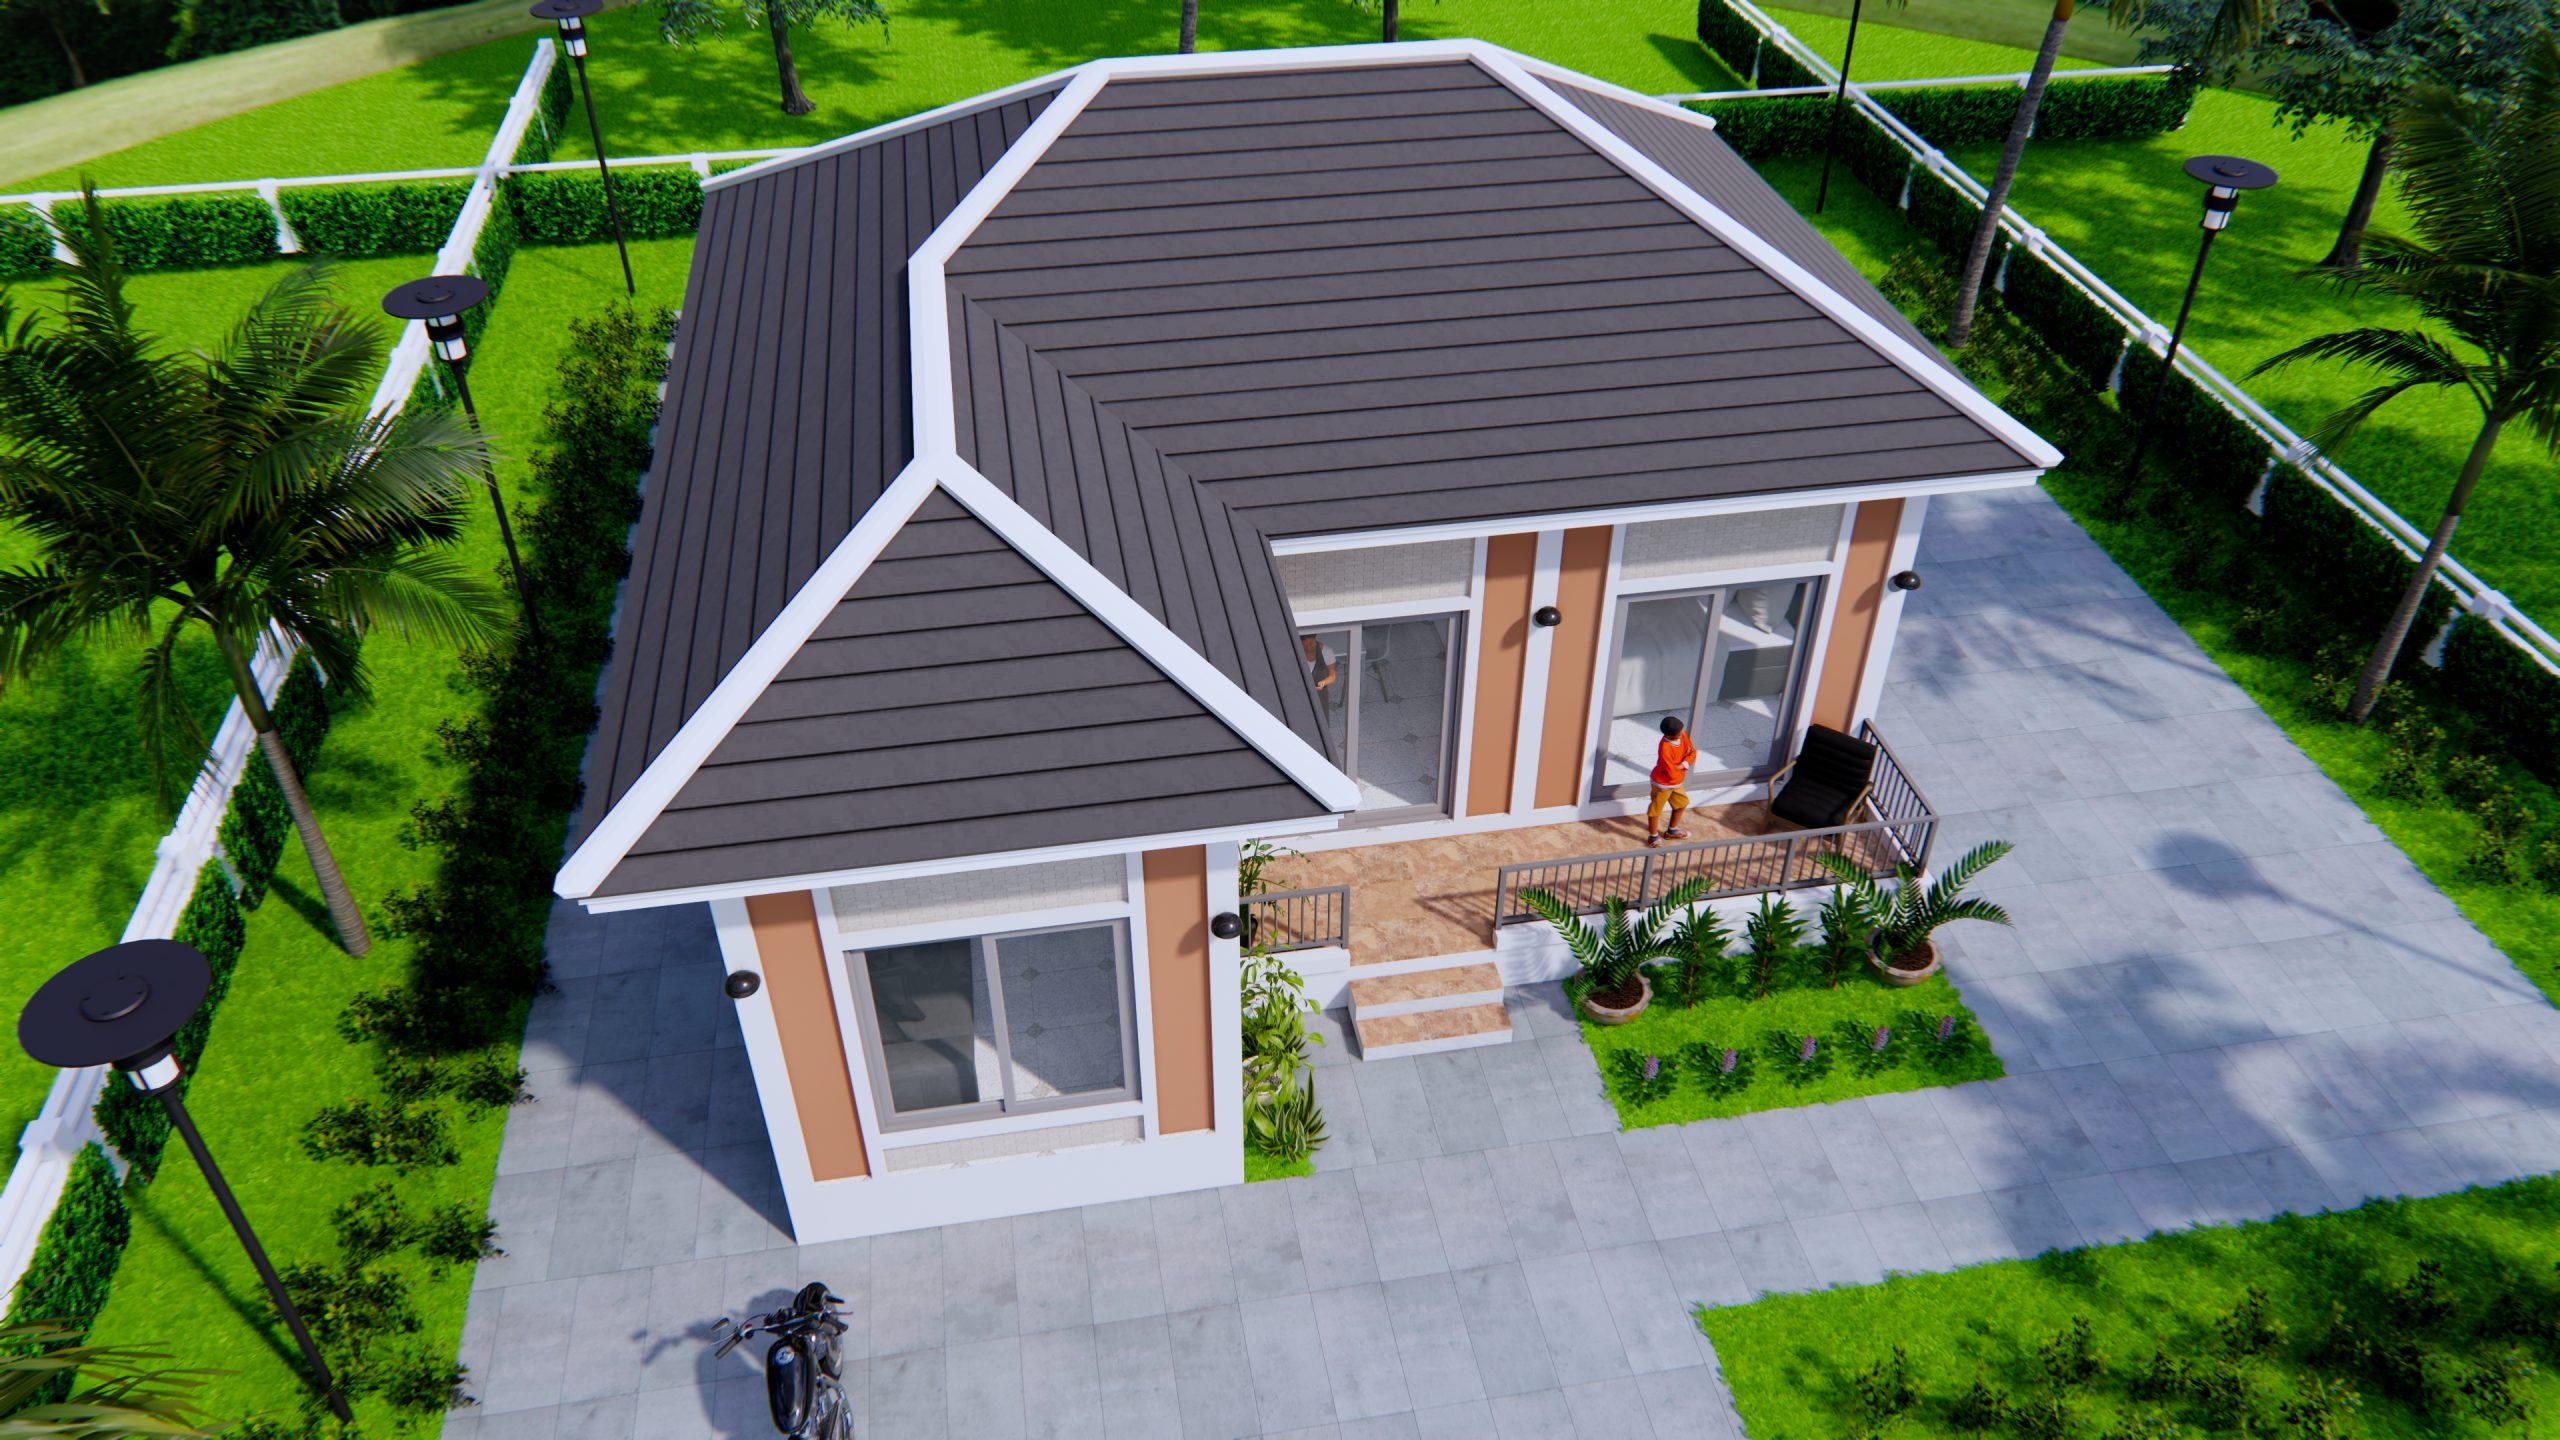 Exterior Home Design 9x9 Meters 30x30 Feet 2 Beds 2